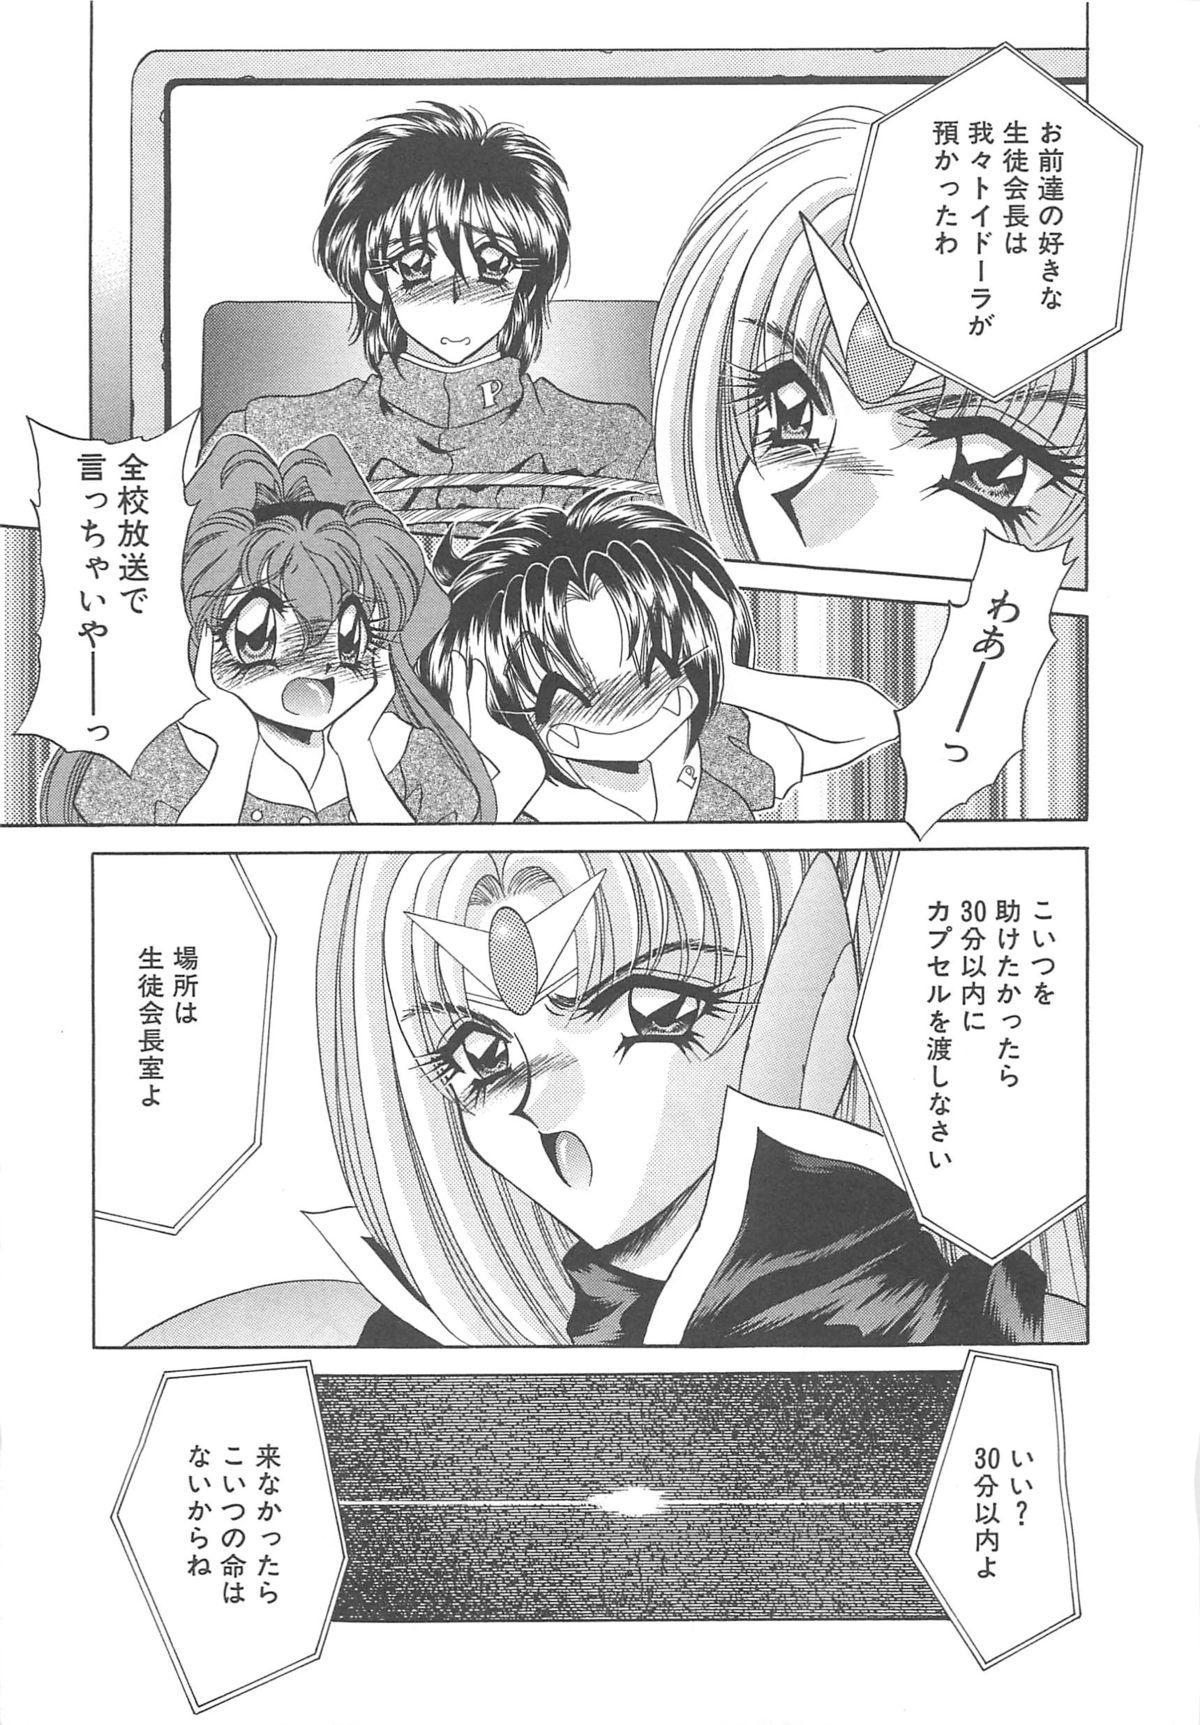 Kigurumi Sentai Quiltian 173